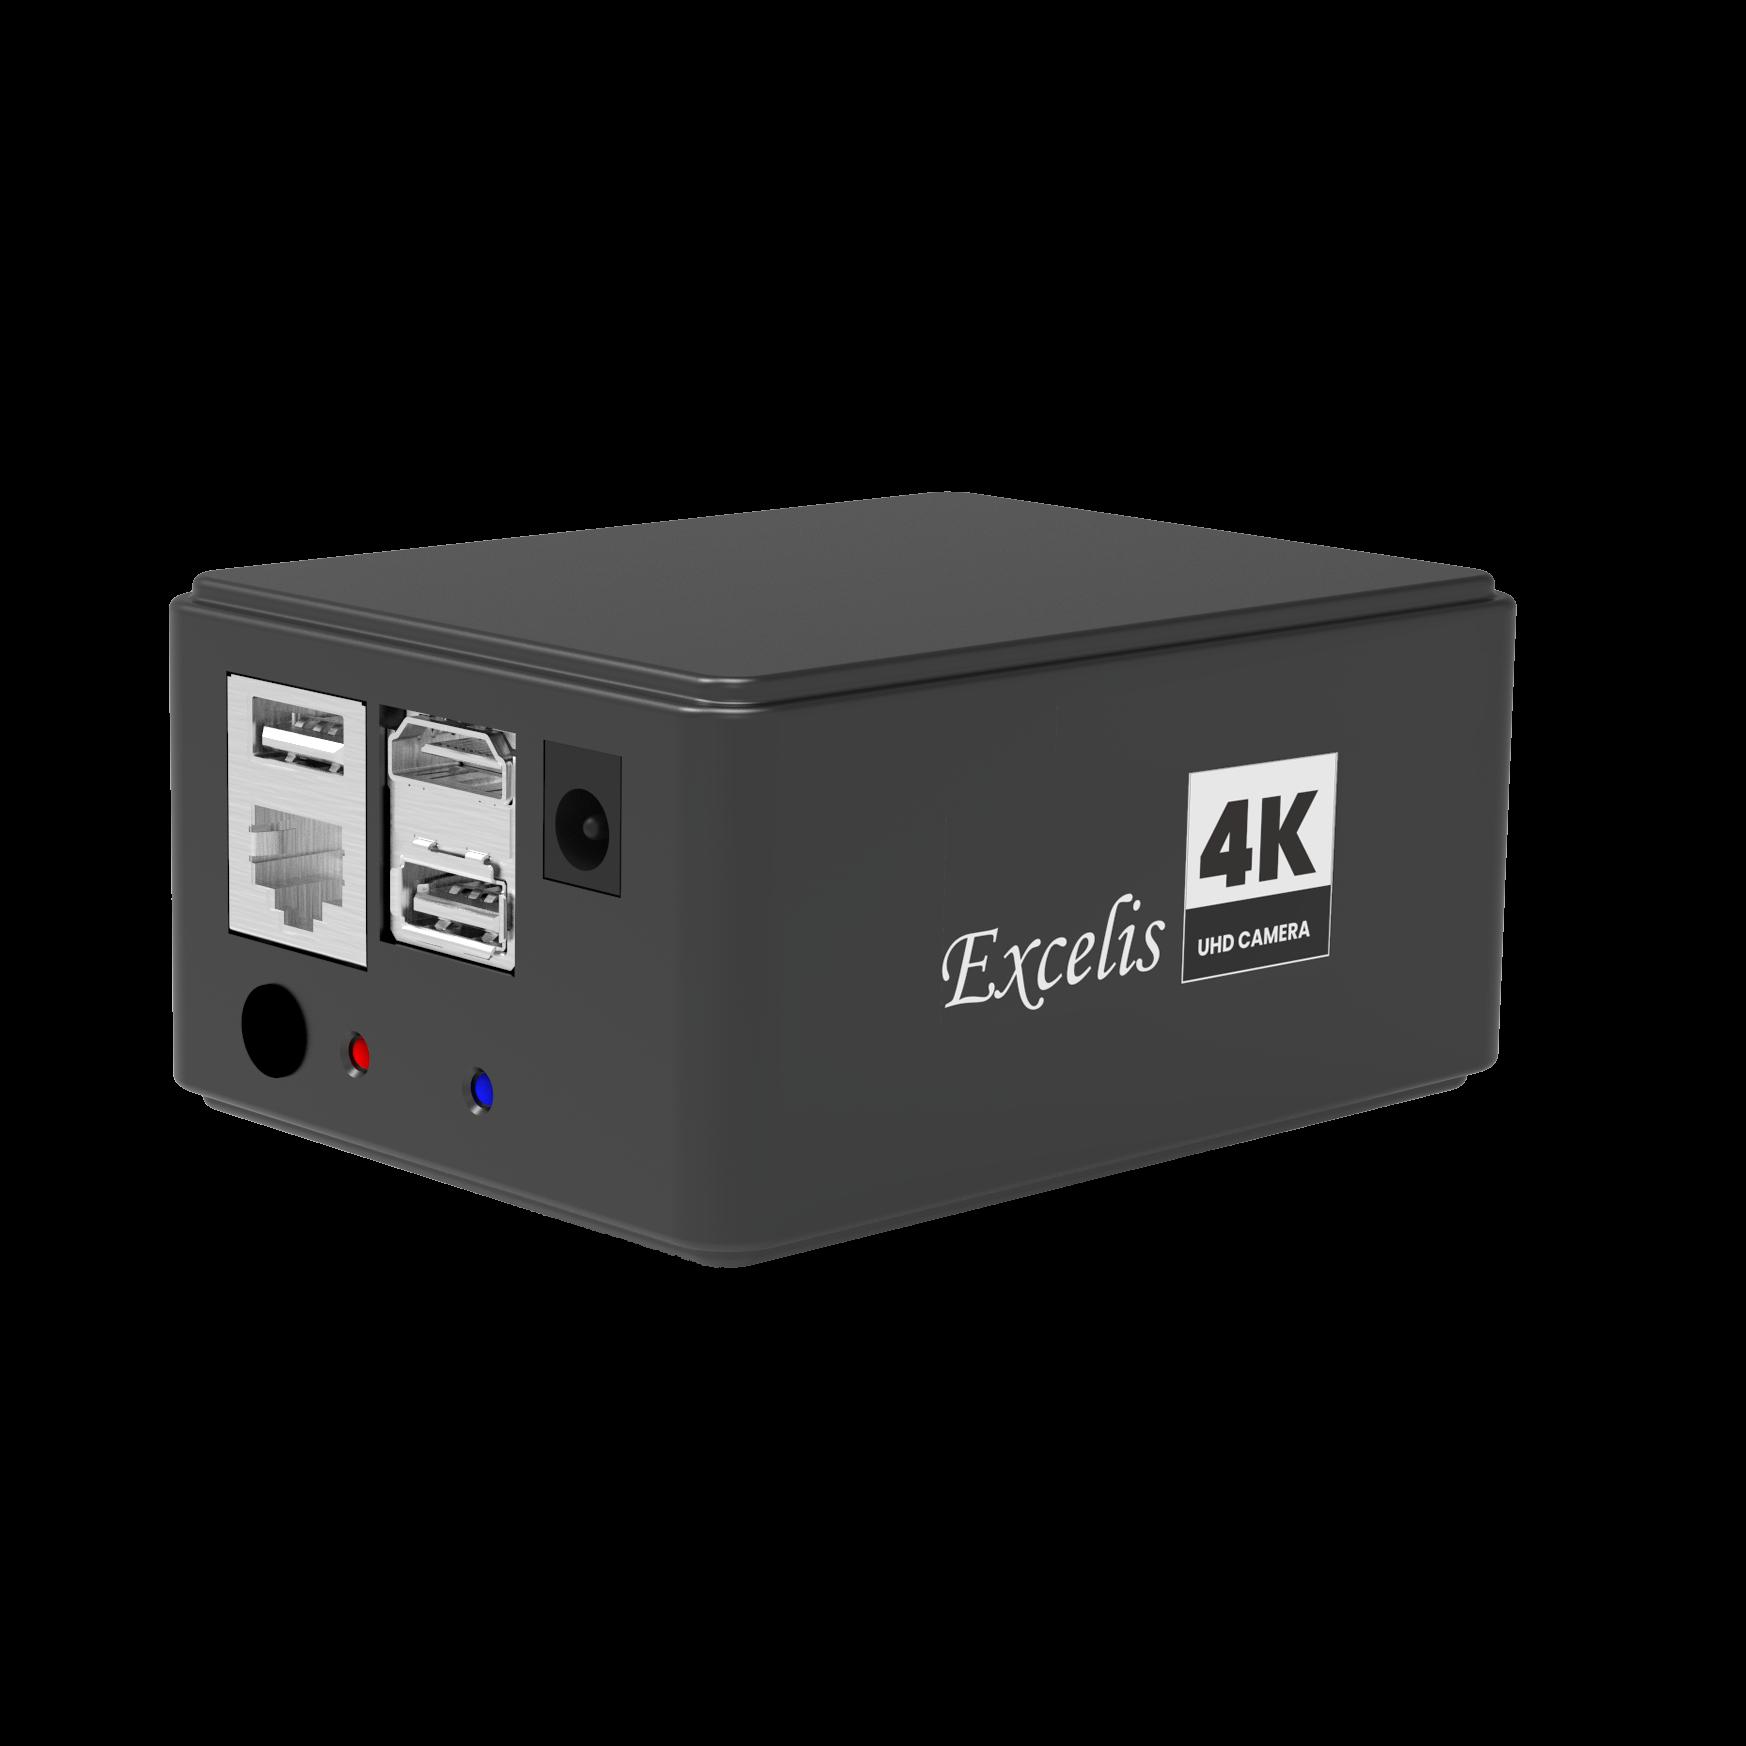 Excelis 4K Camera